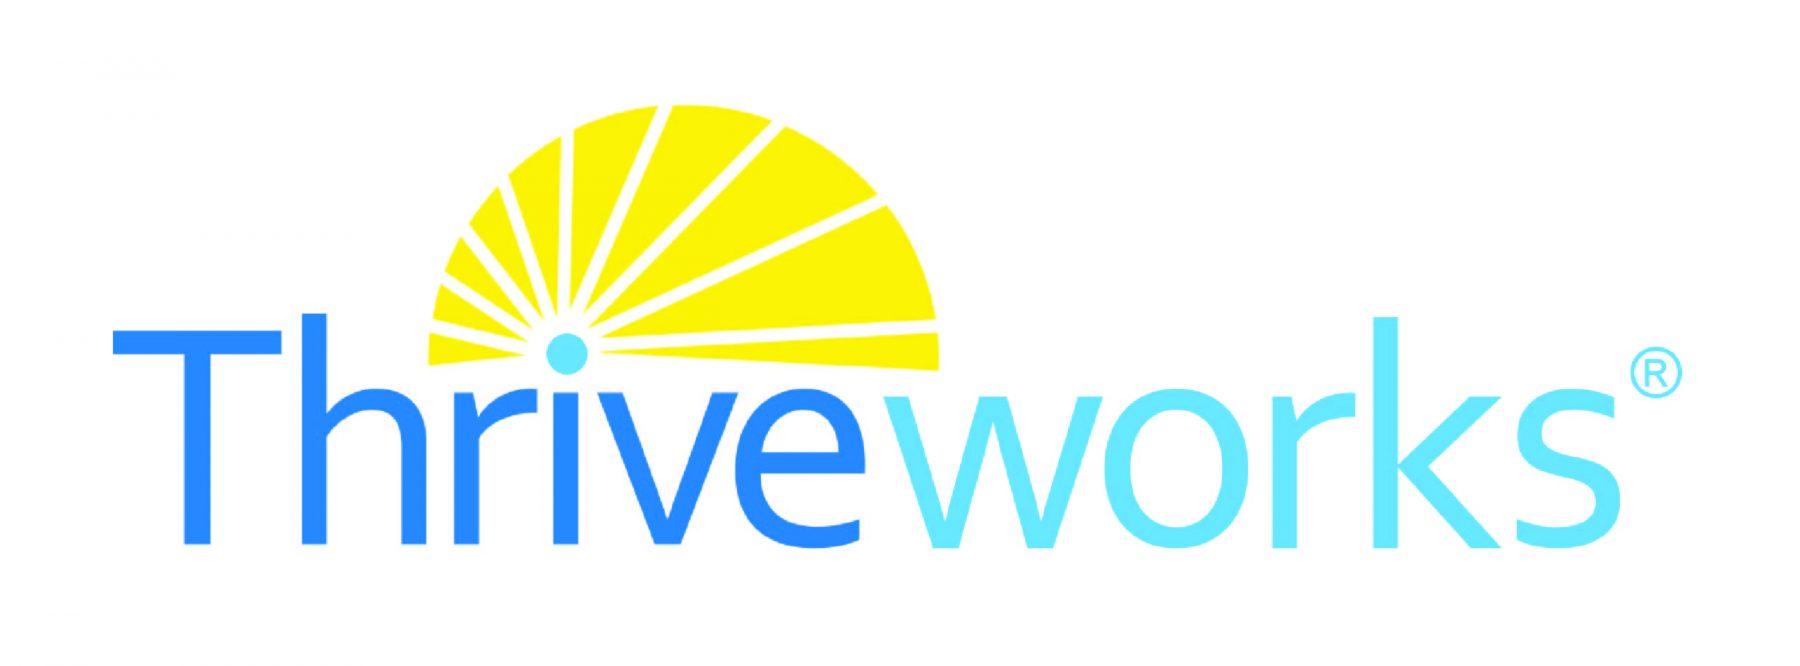 thriveworks-white